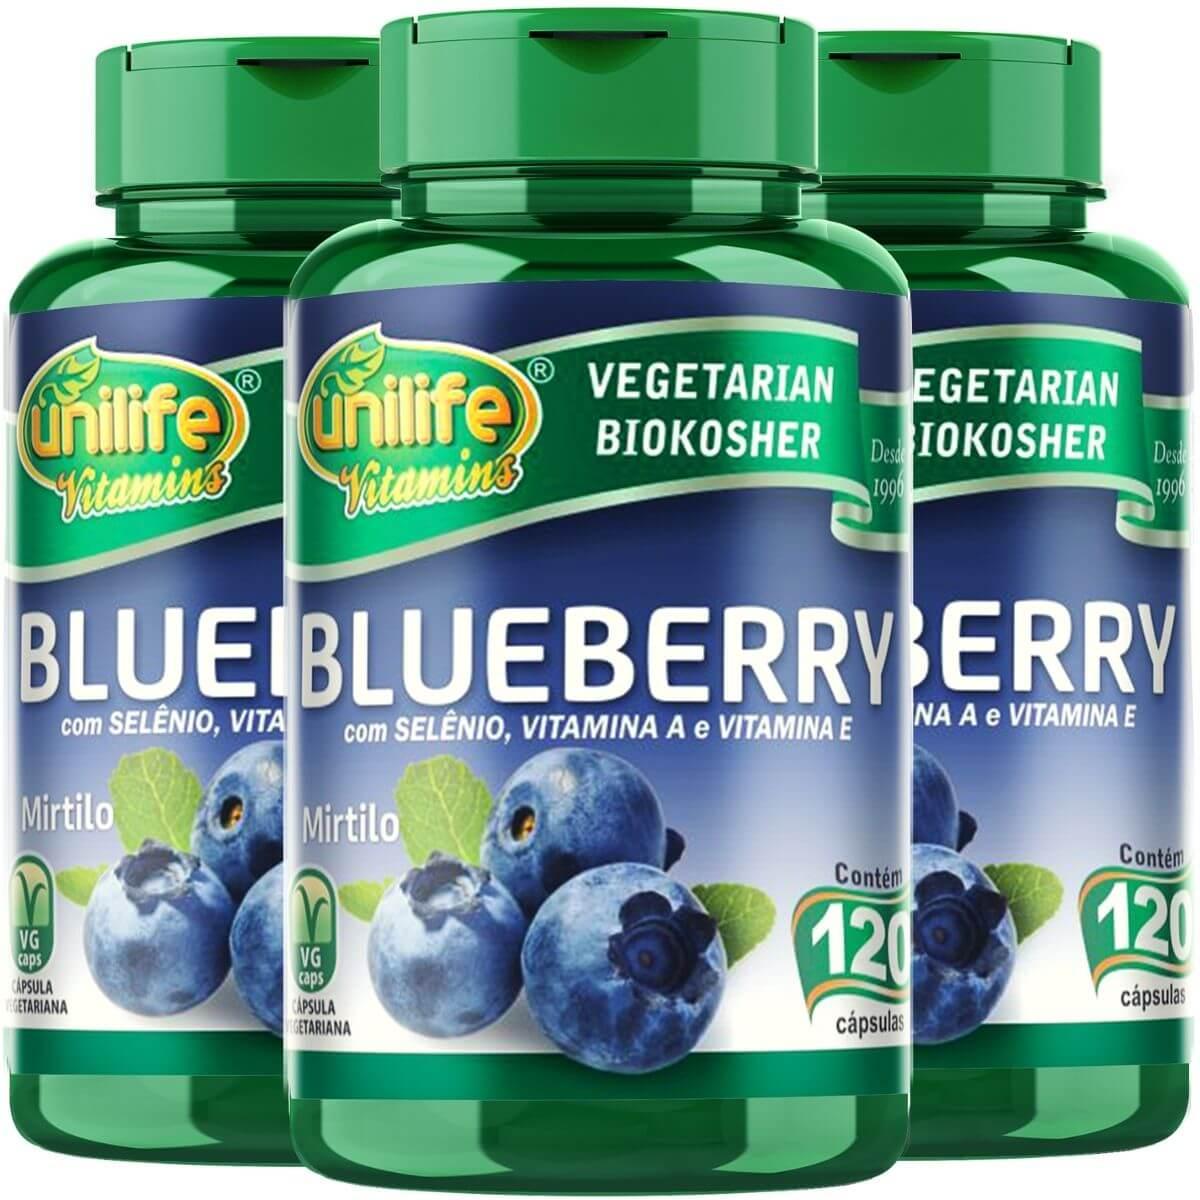 Kit 3 Blueberry Mirtilo Antioxidante Unilife - 120 Cápsulas 550mg